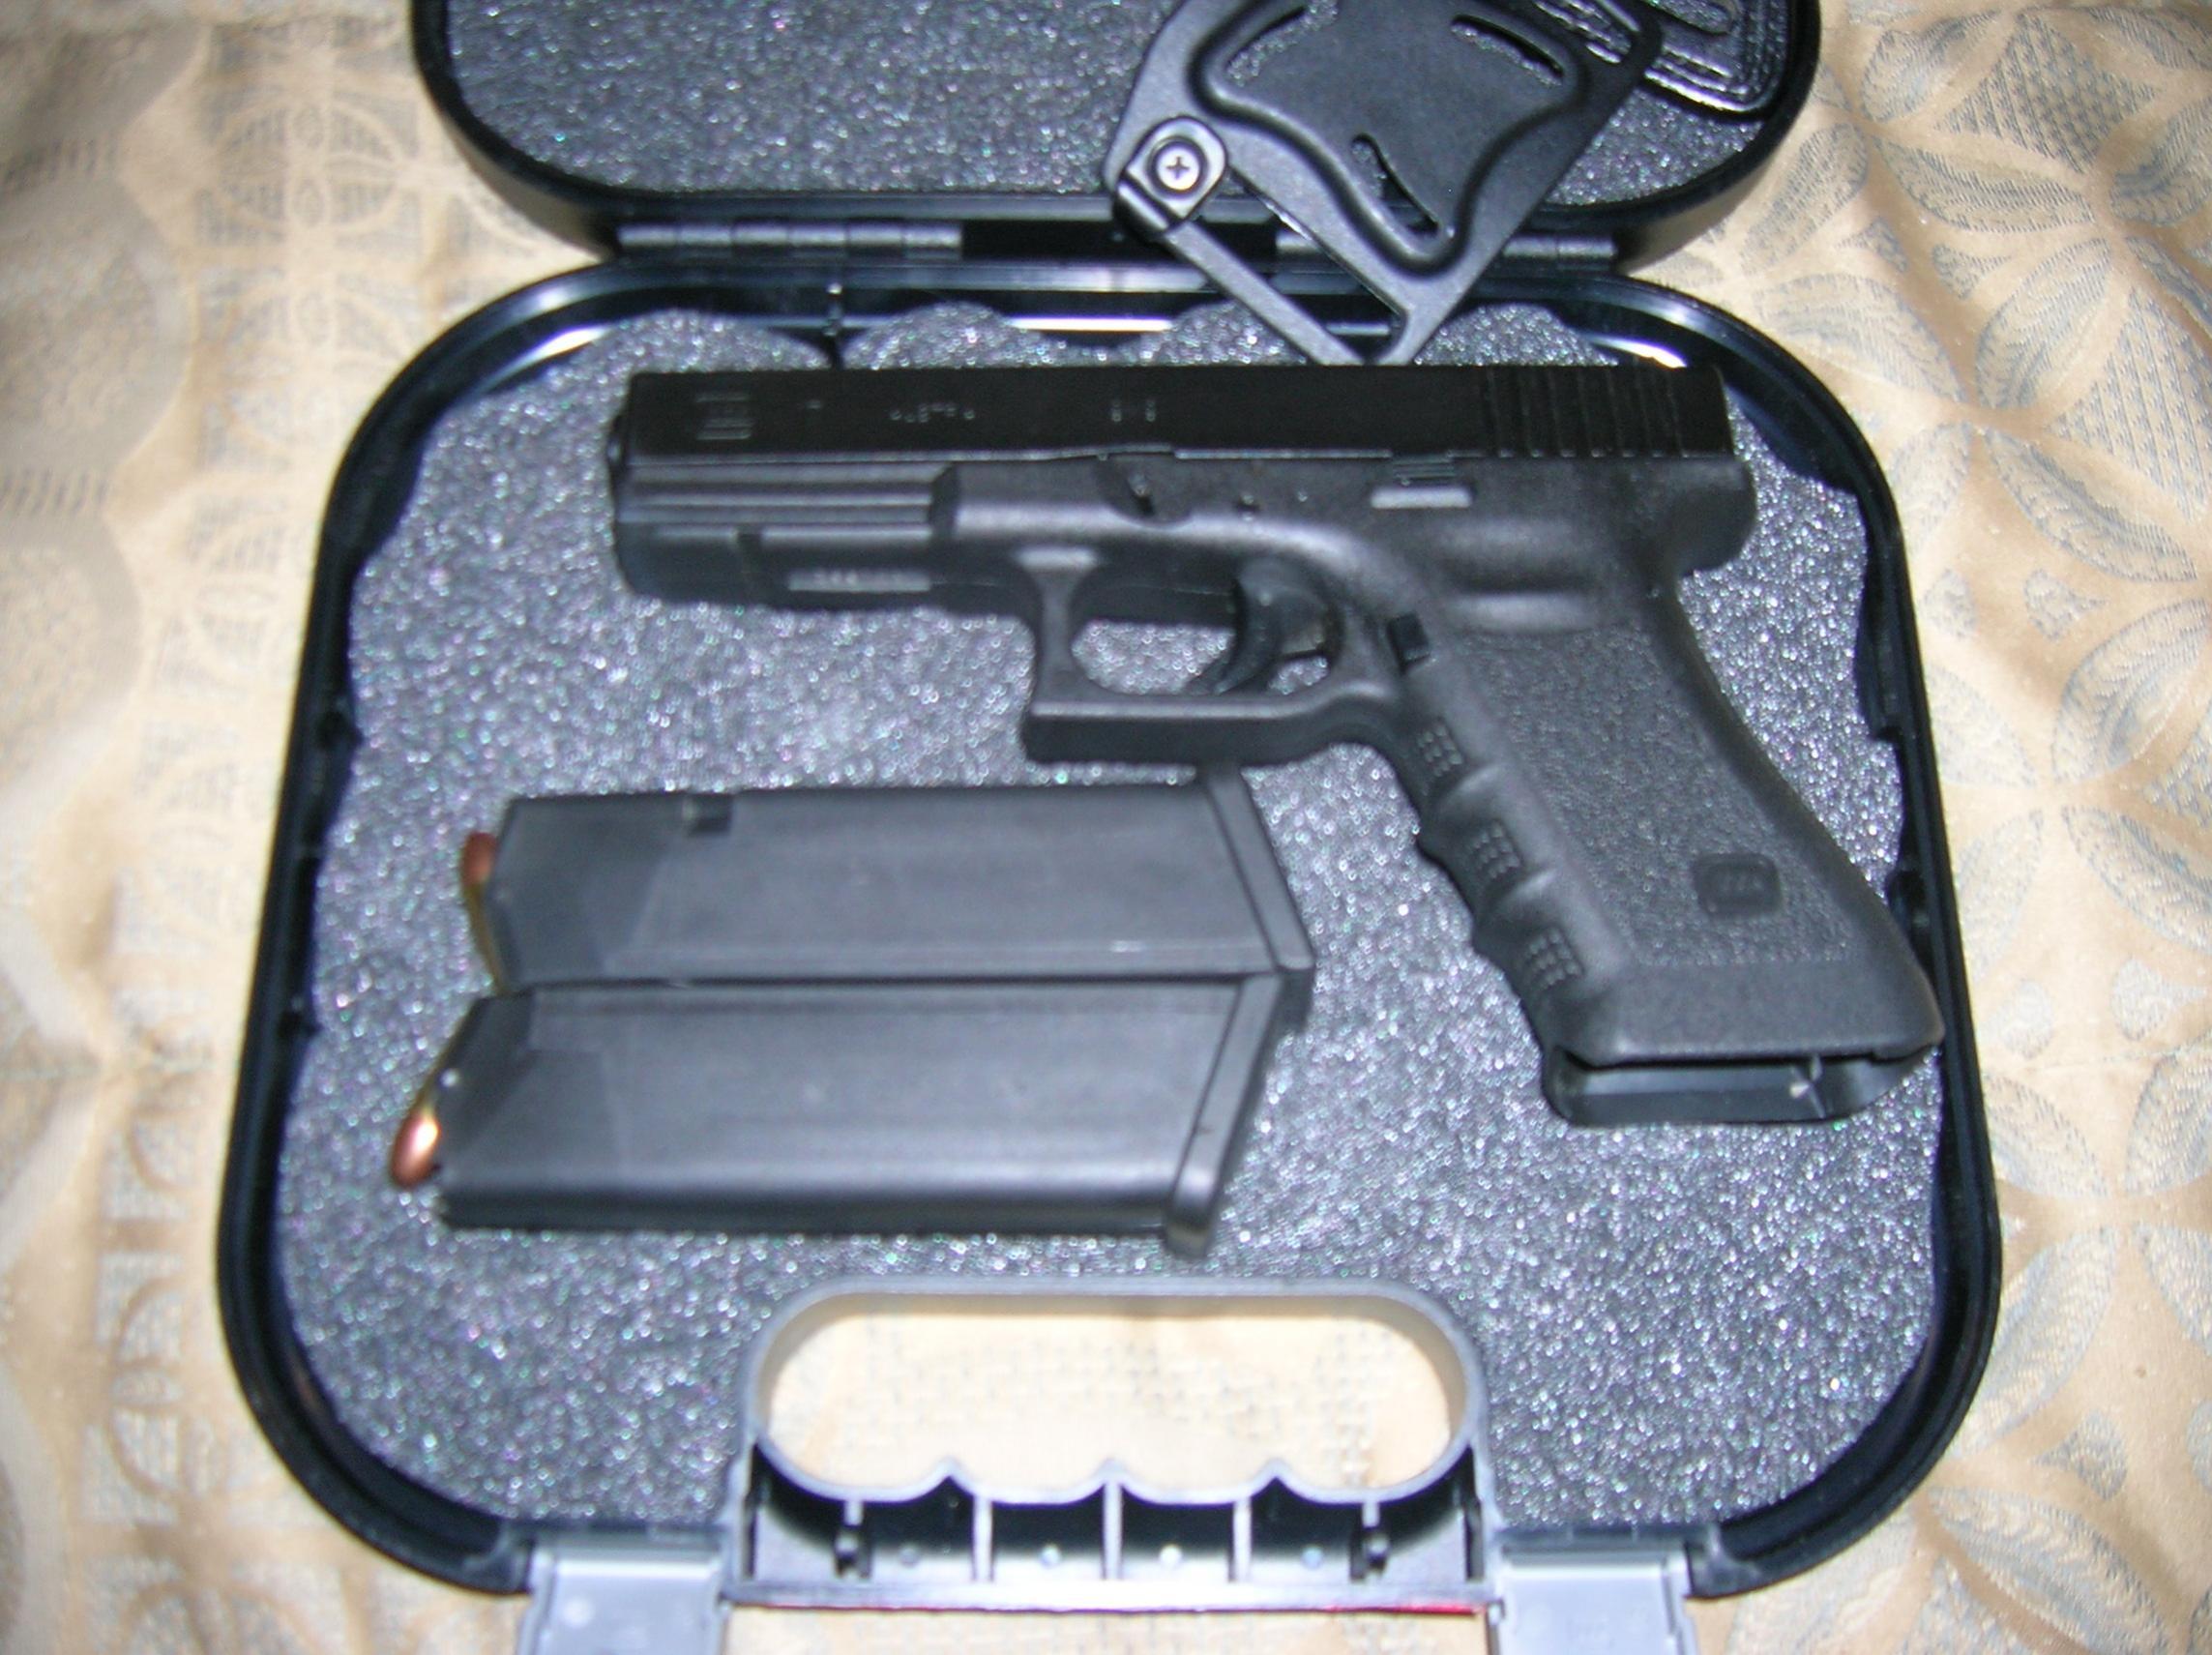 Glock 17 for trade - VA Beach, Richmond, Roanoke-dscn2165.jpg